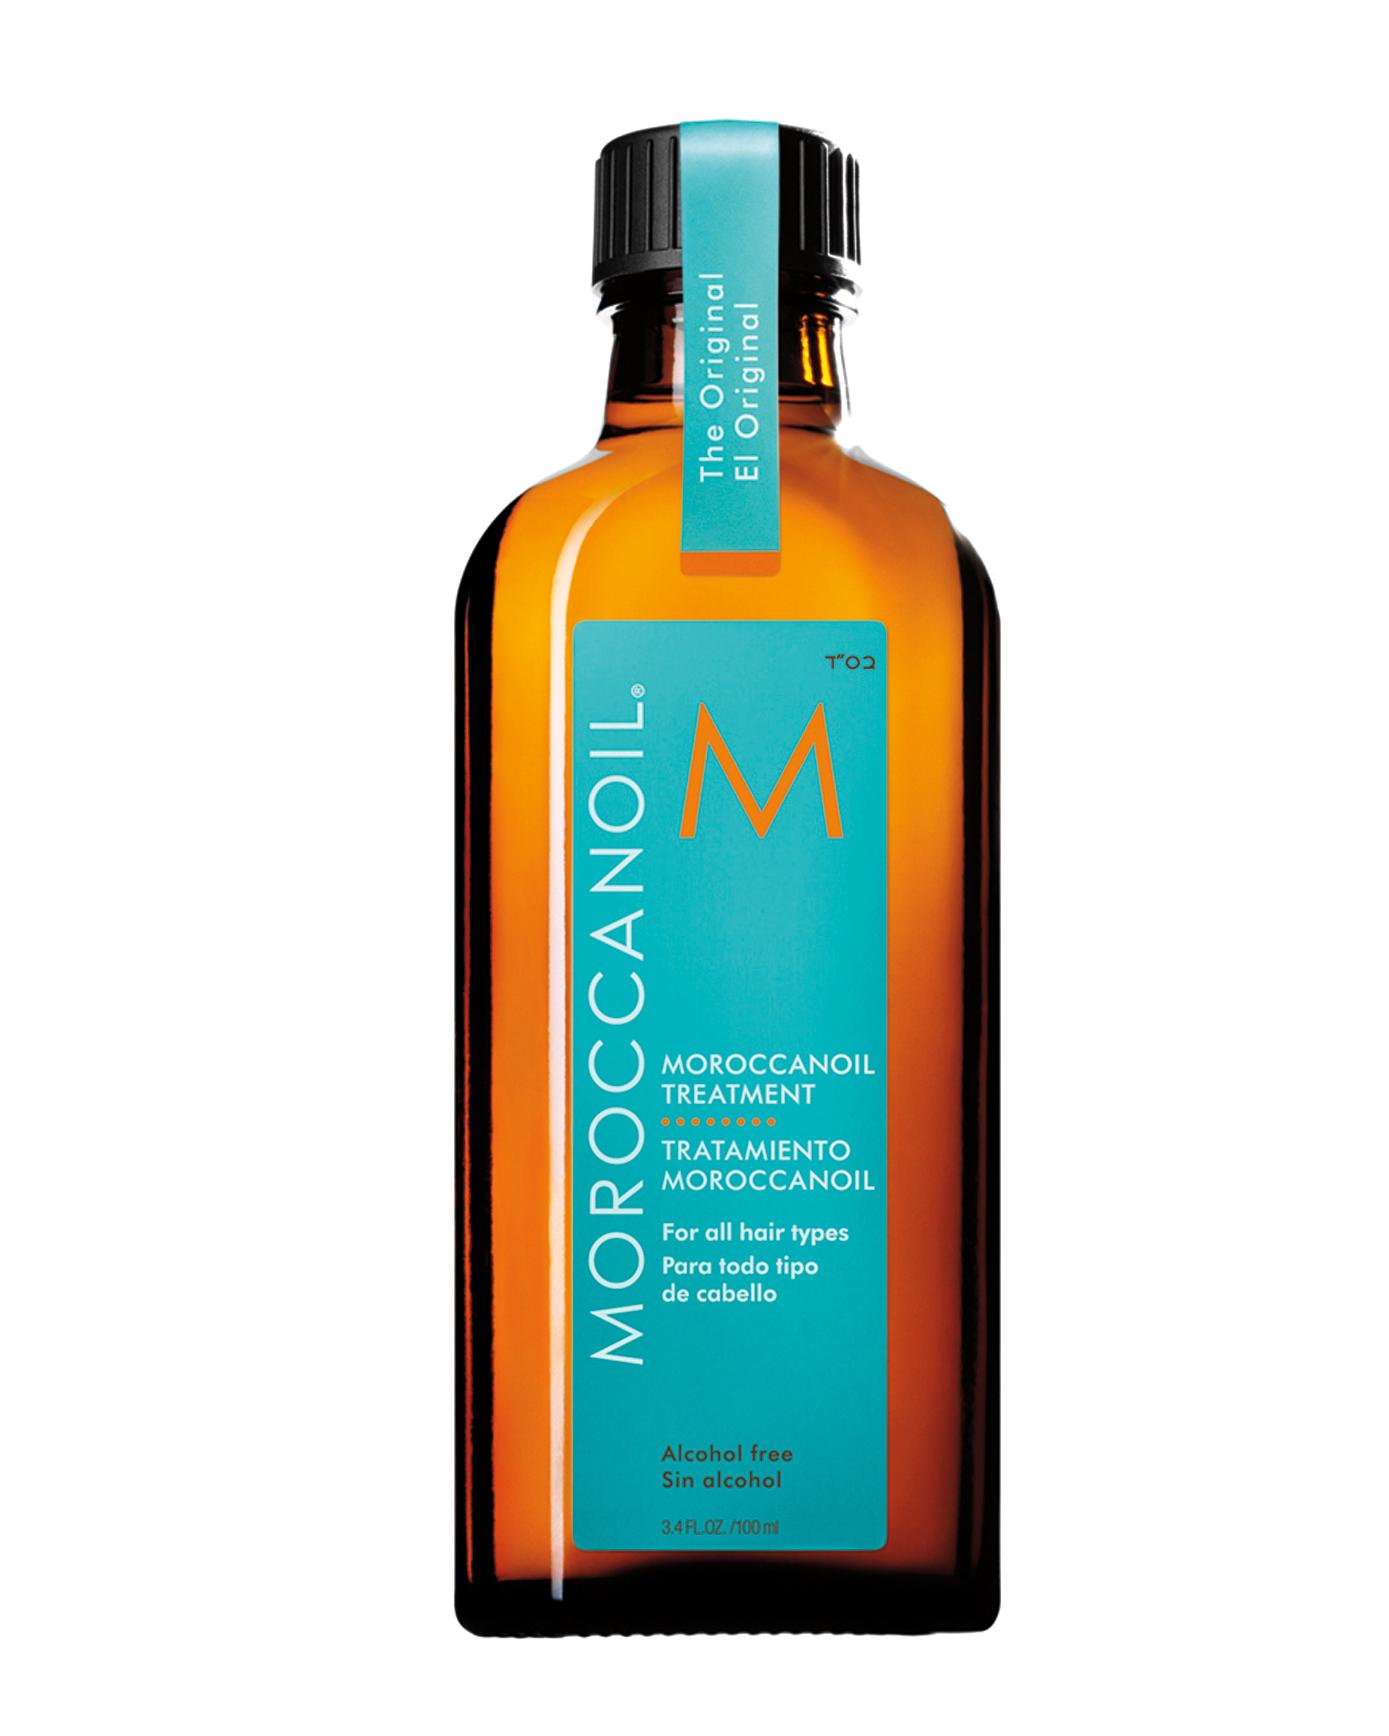 moroccanoil-treatment-0314.jpg